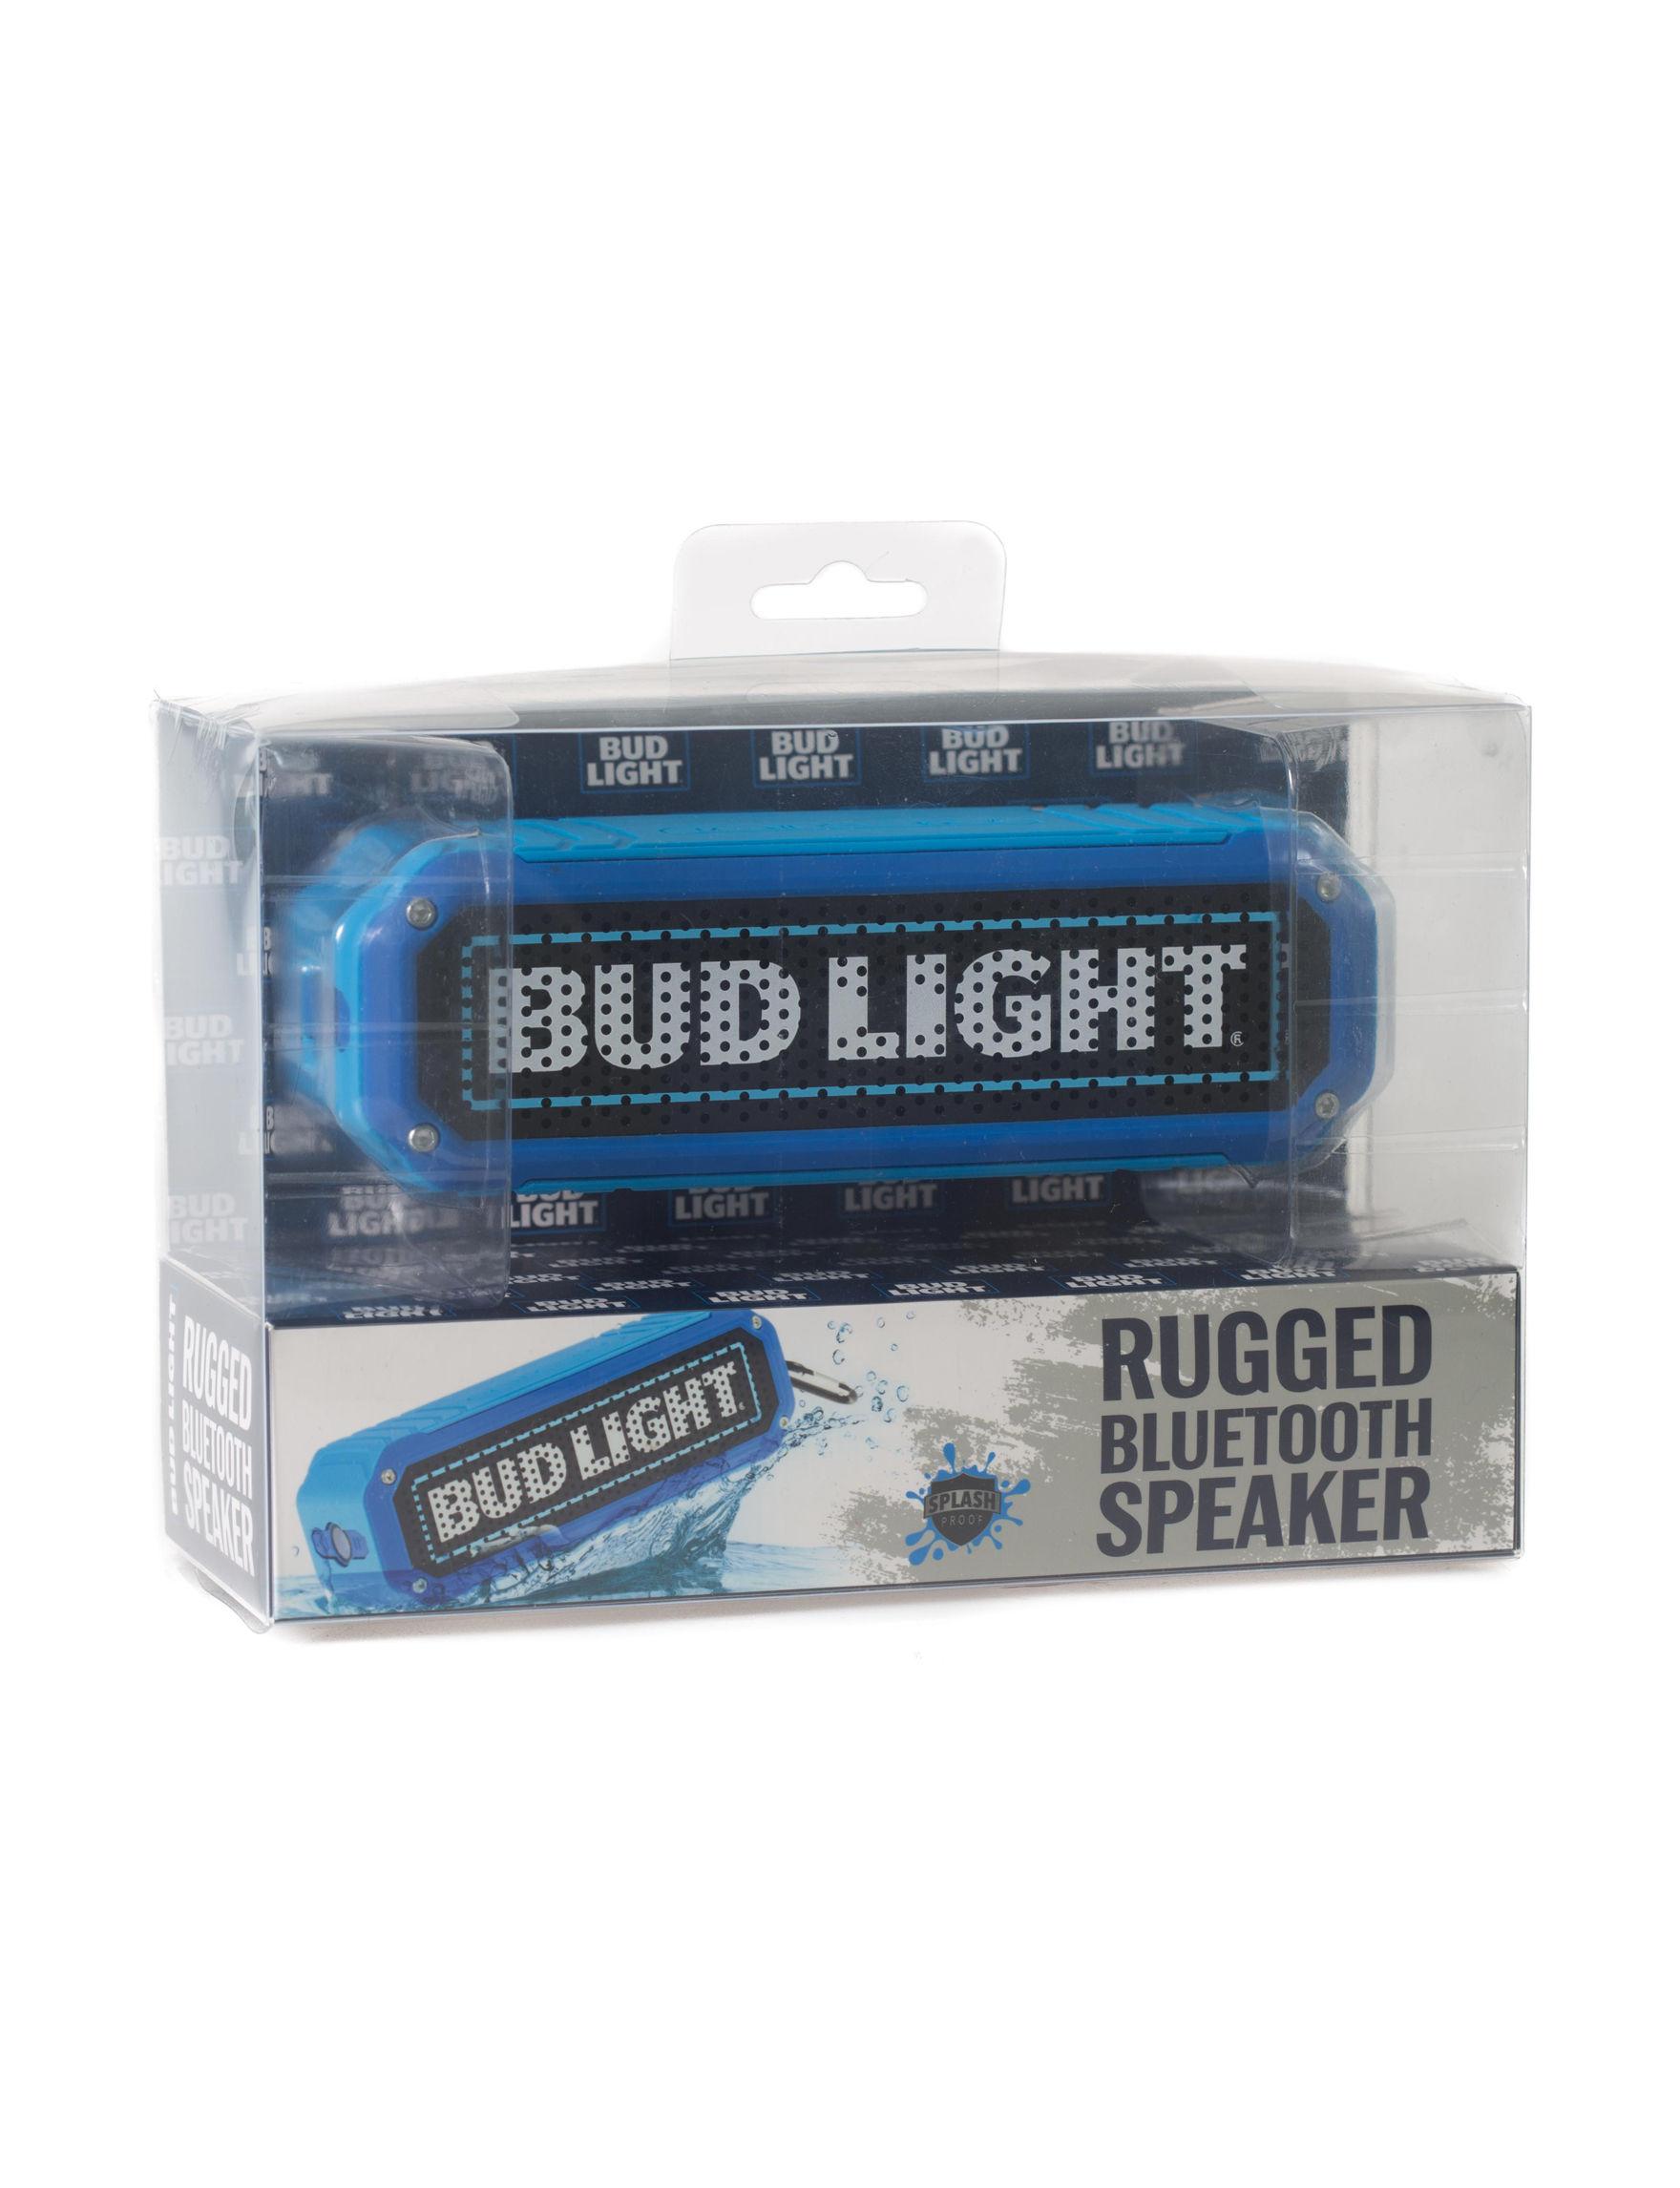 Bud Light Blue / Black Speakers & Docks Home & Portable Audio